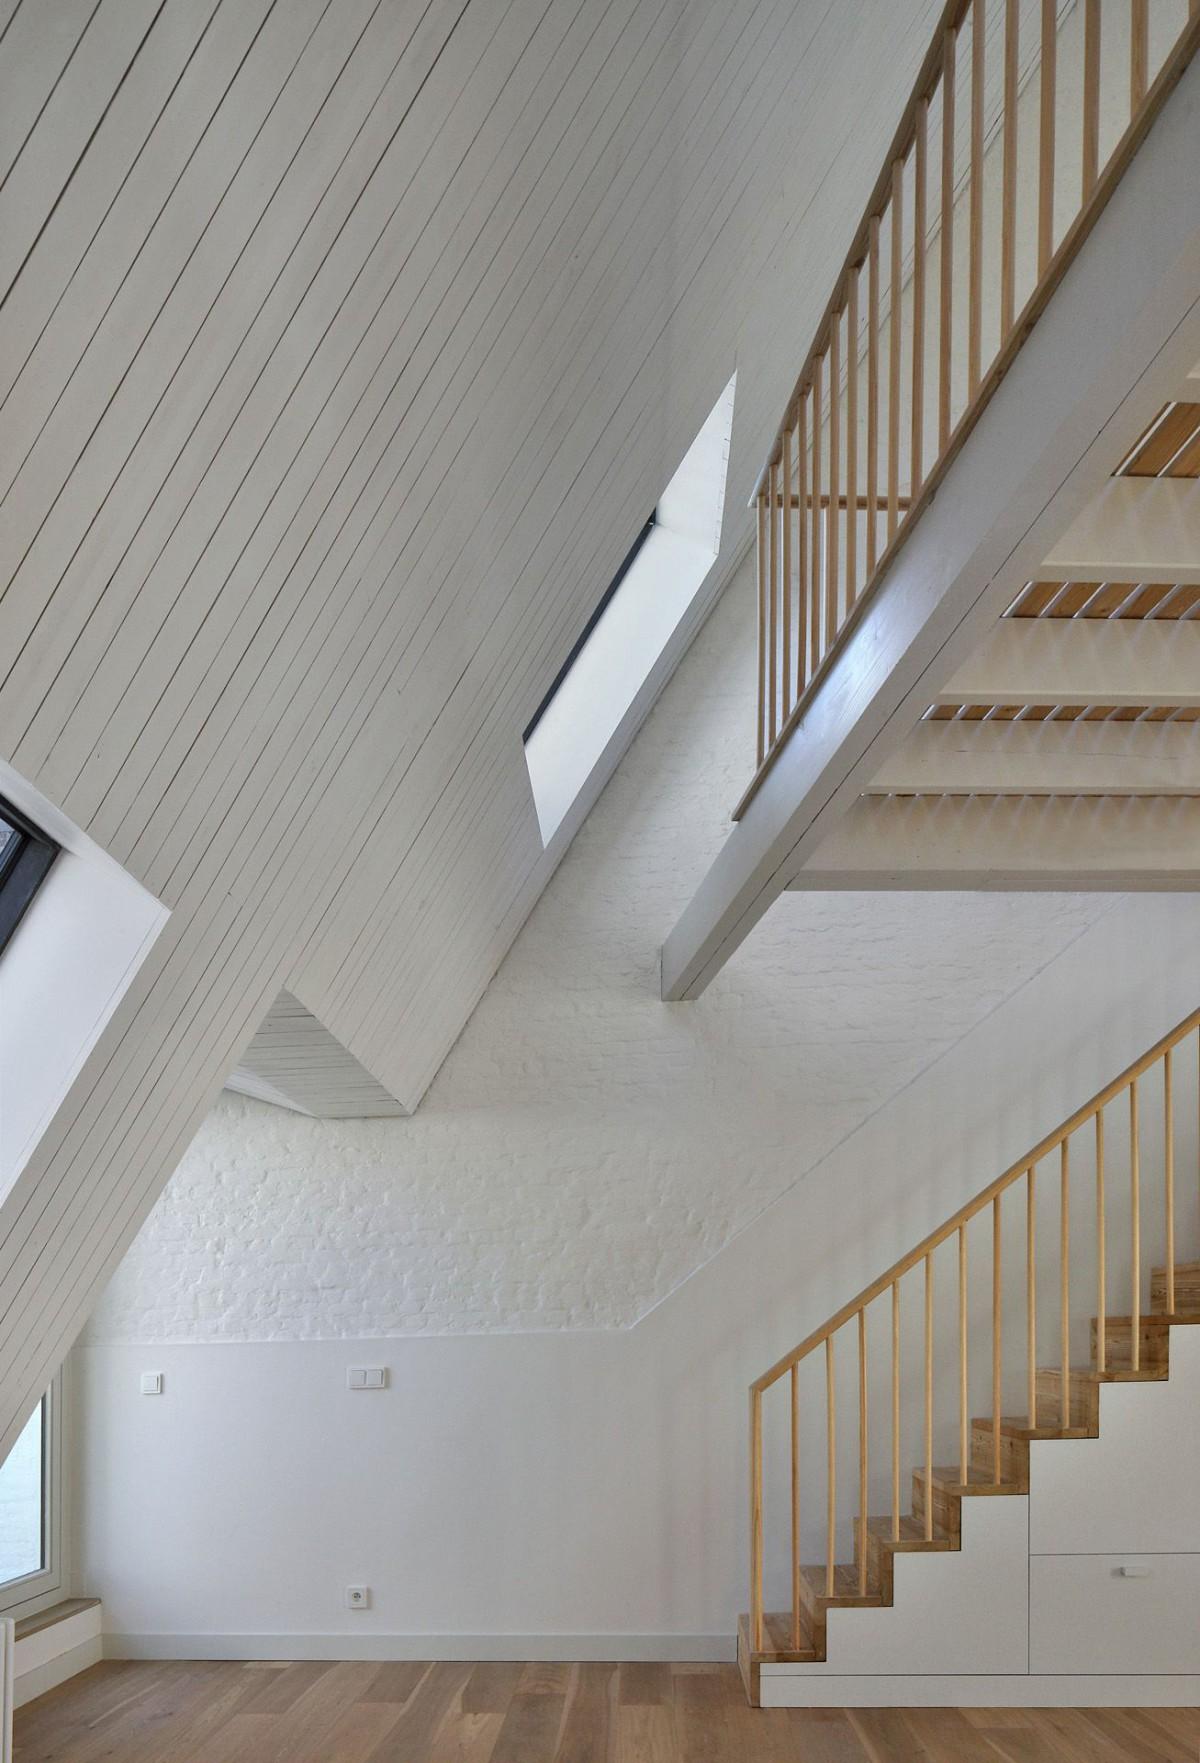 Bovenbouw Architectuur . Refurbishment of 3 historical buildings . Antwerp (23)